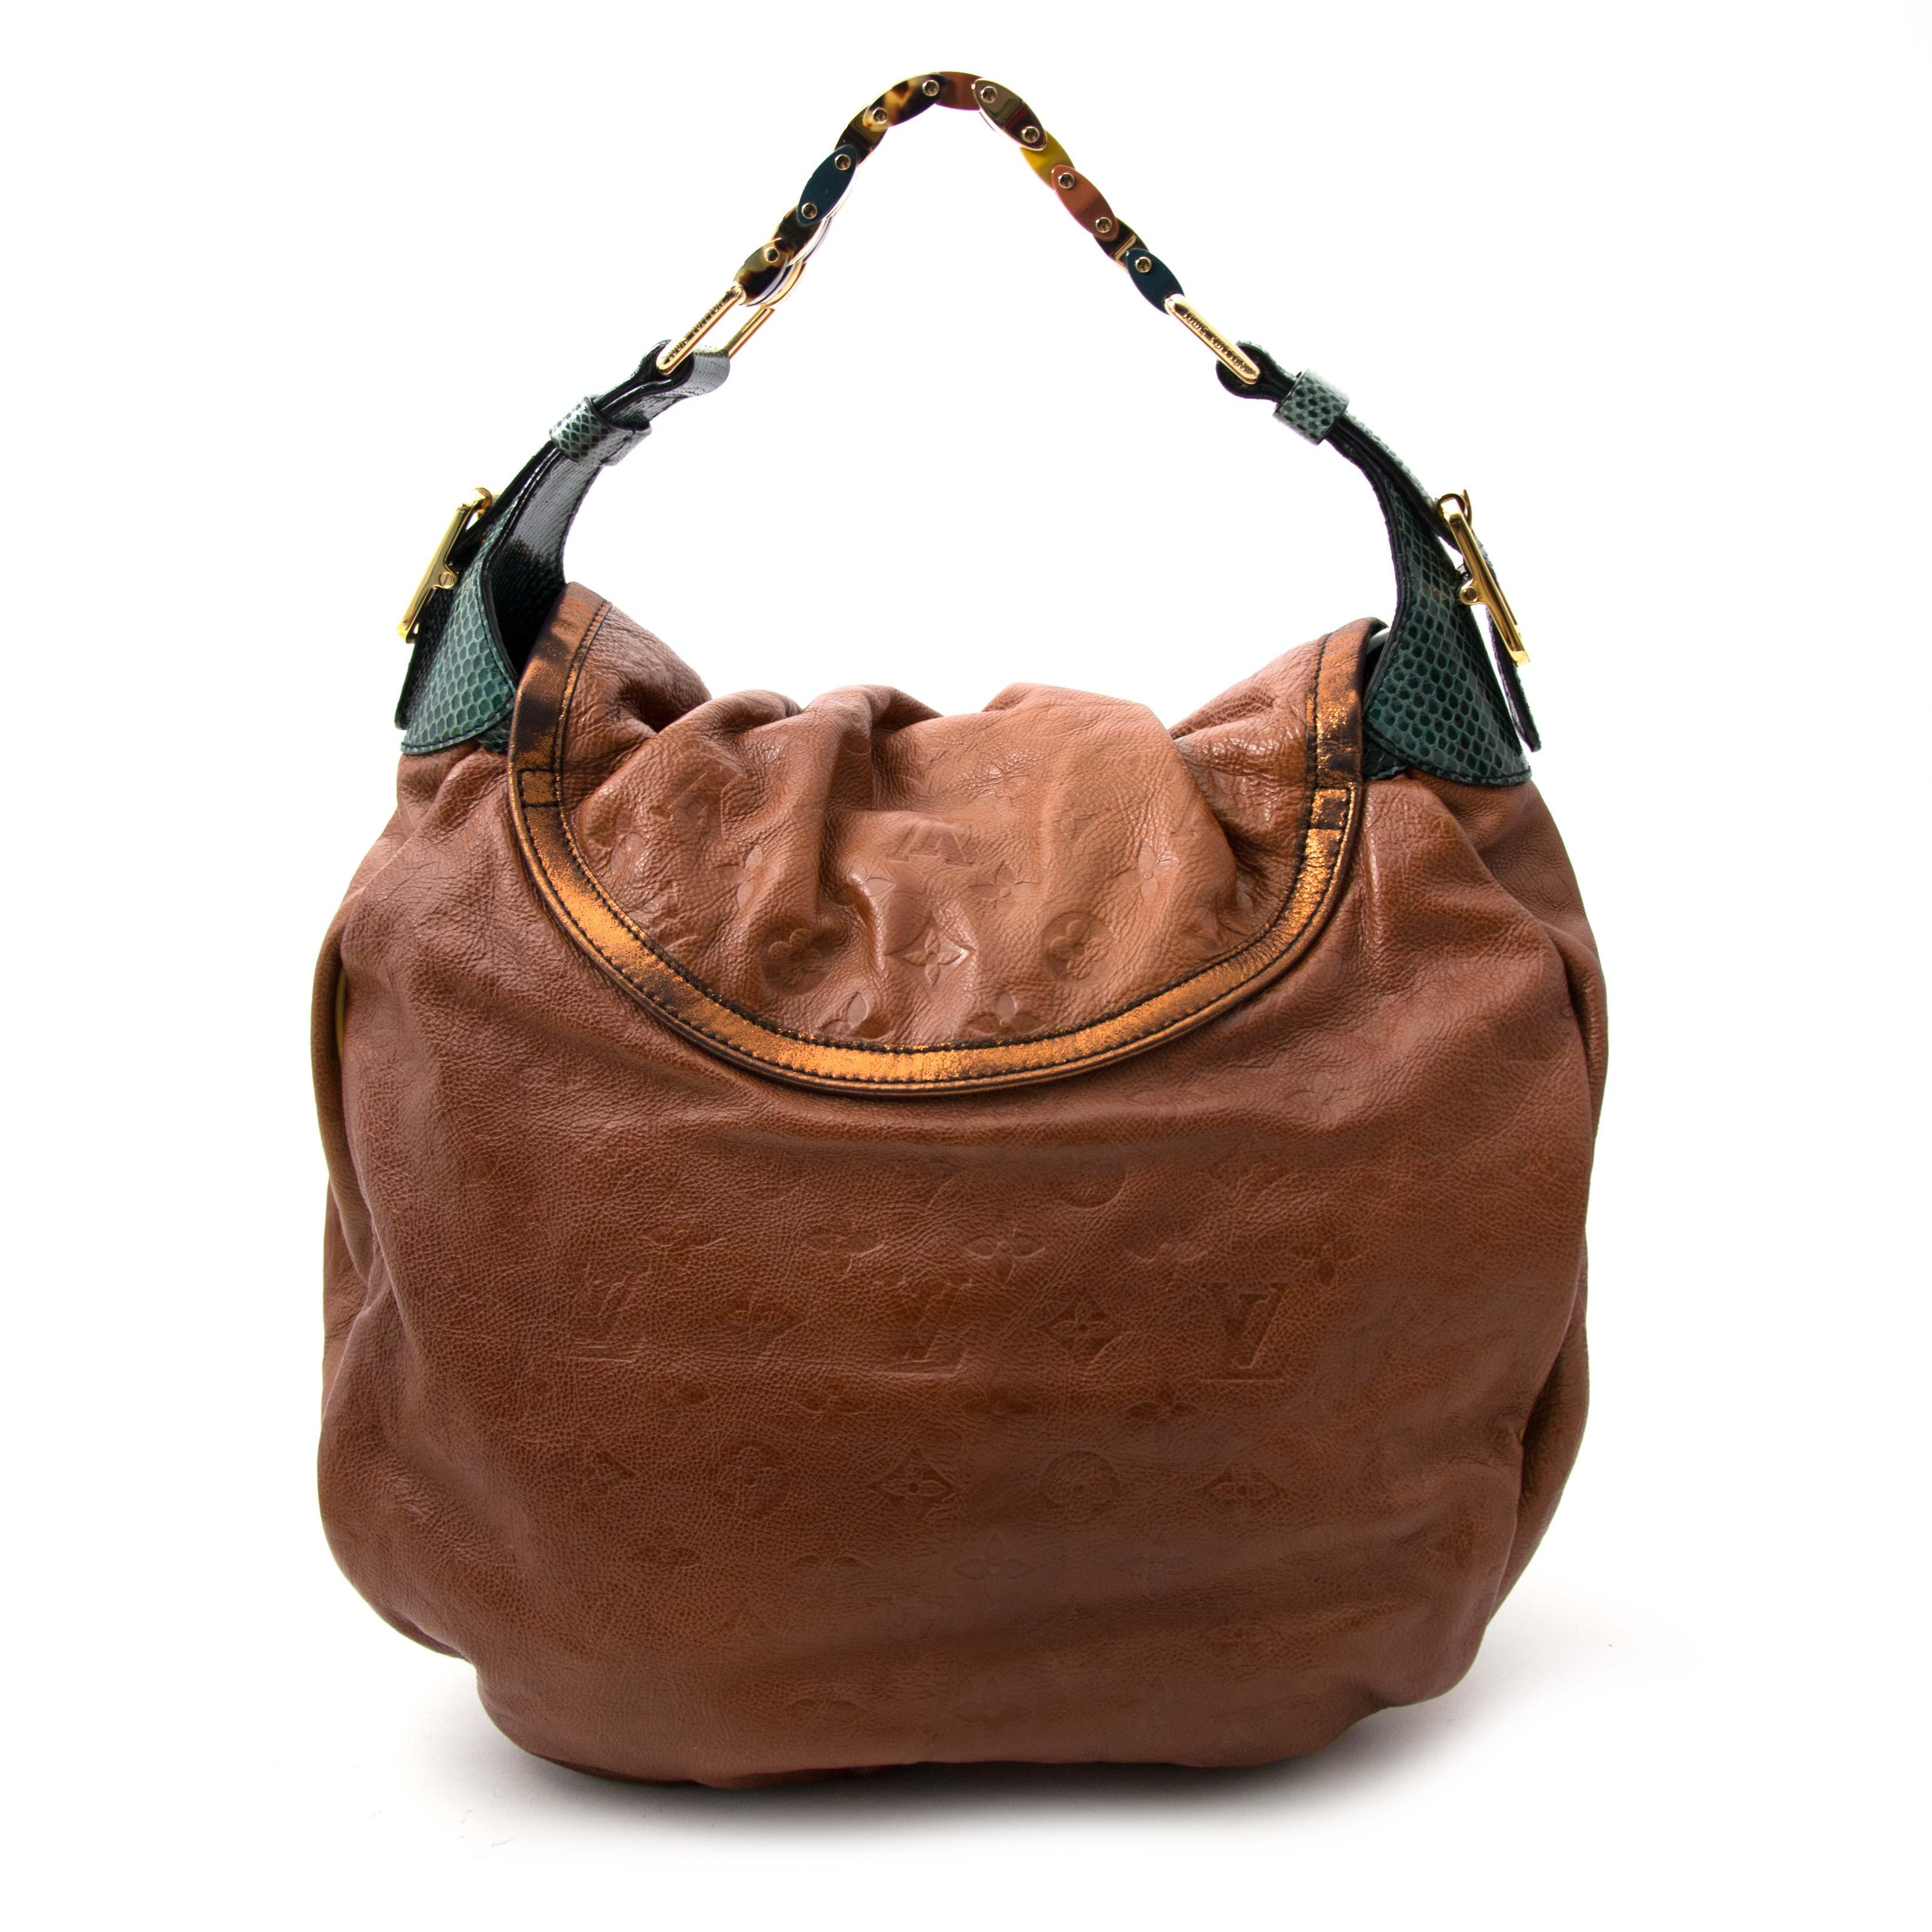 koop online jou tweedehands Louis Vuitton Limited Edition